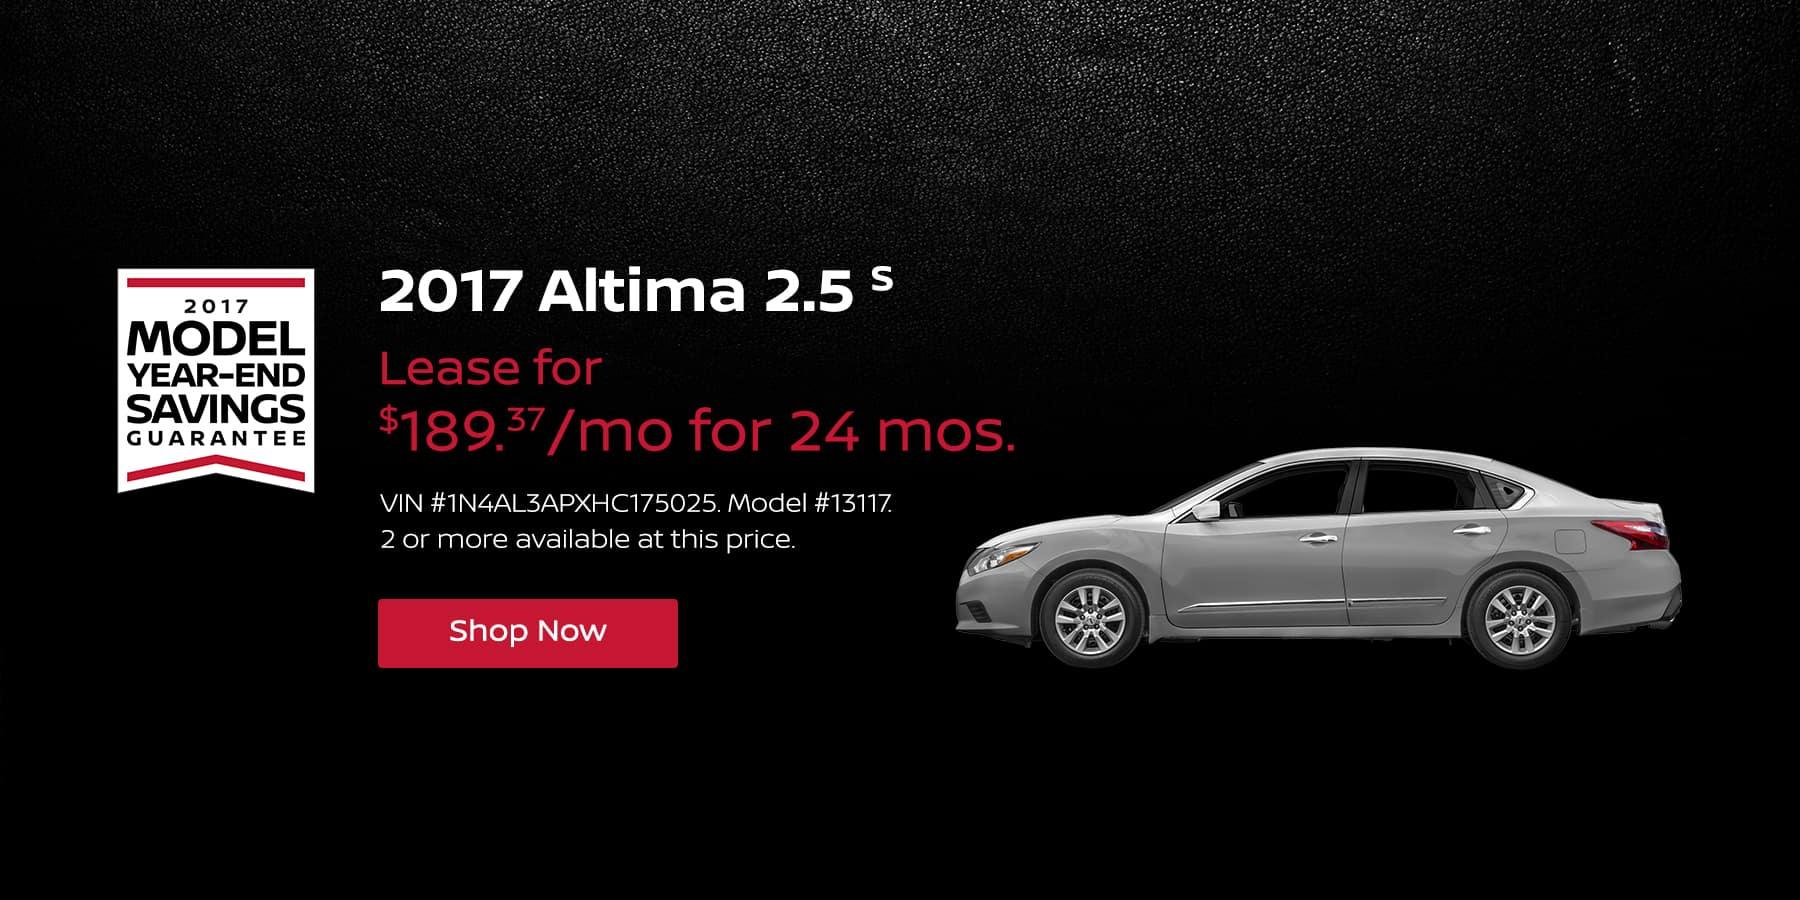 Altima 2.5 S January Offer Jeffrey Nissan